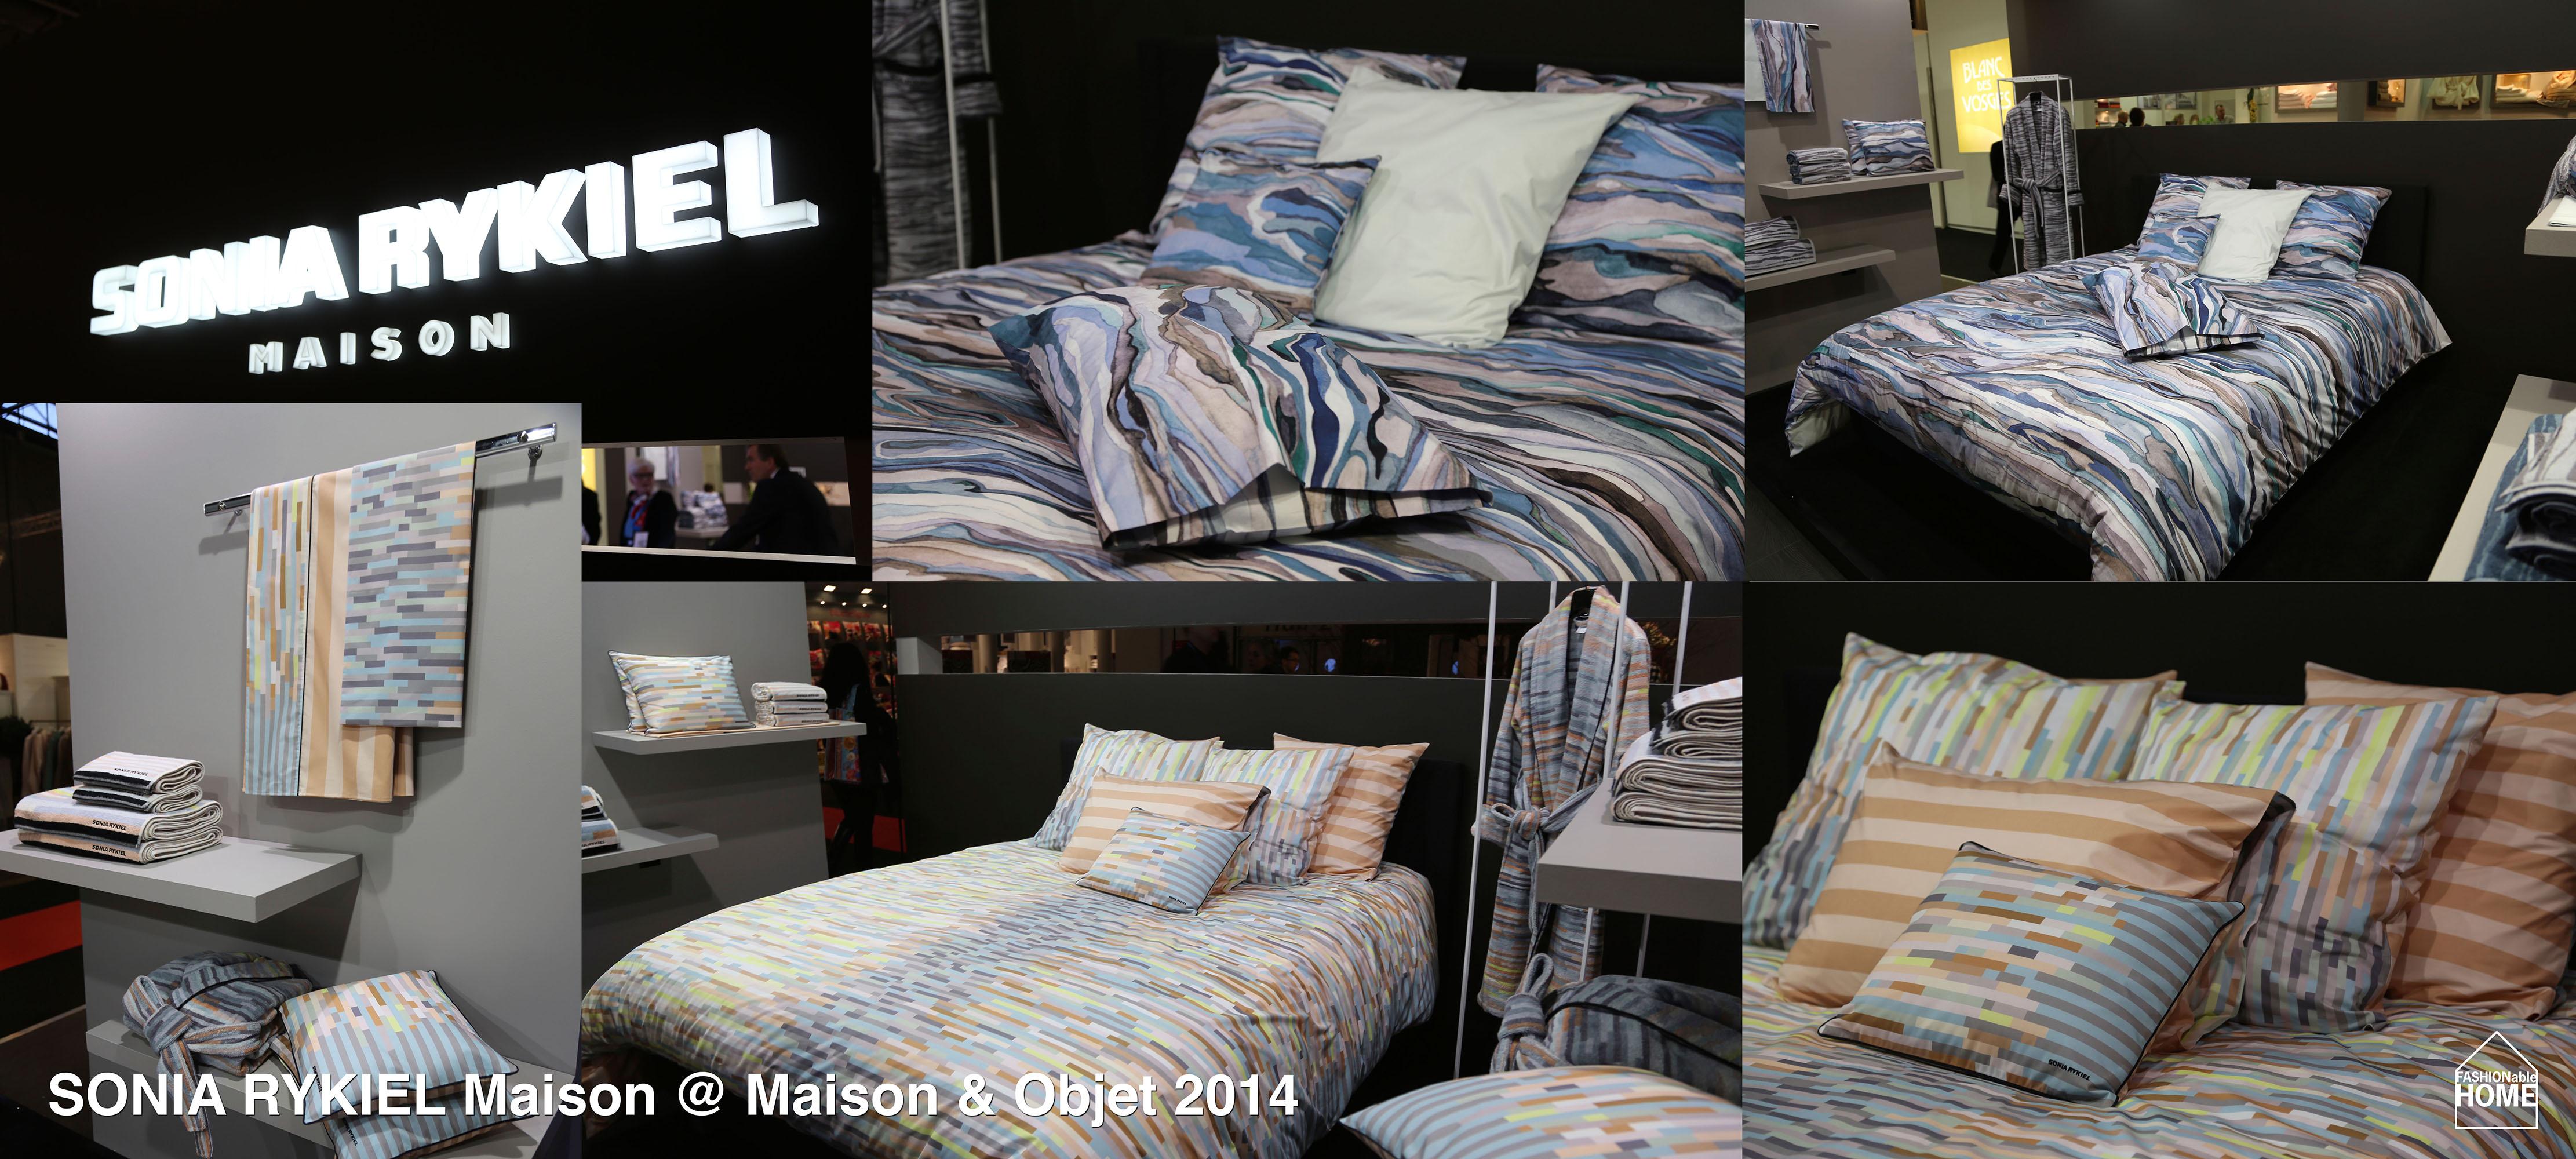 sonia rykiel maison maison objet 2014 fashionable home blog. Black Bedroom Furniture Sets. Home Design Ideas